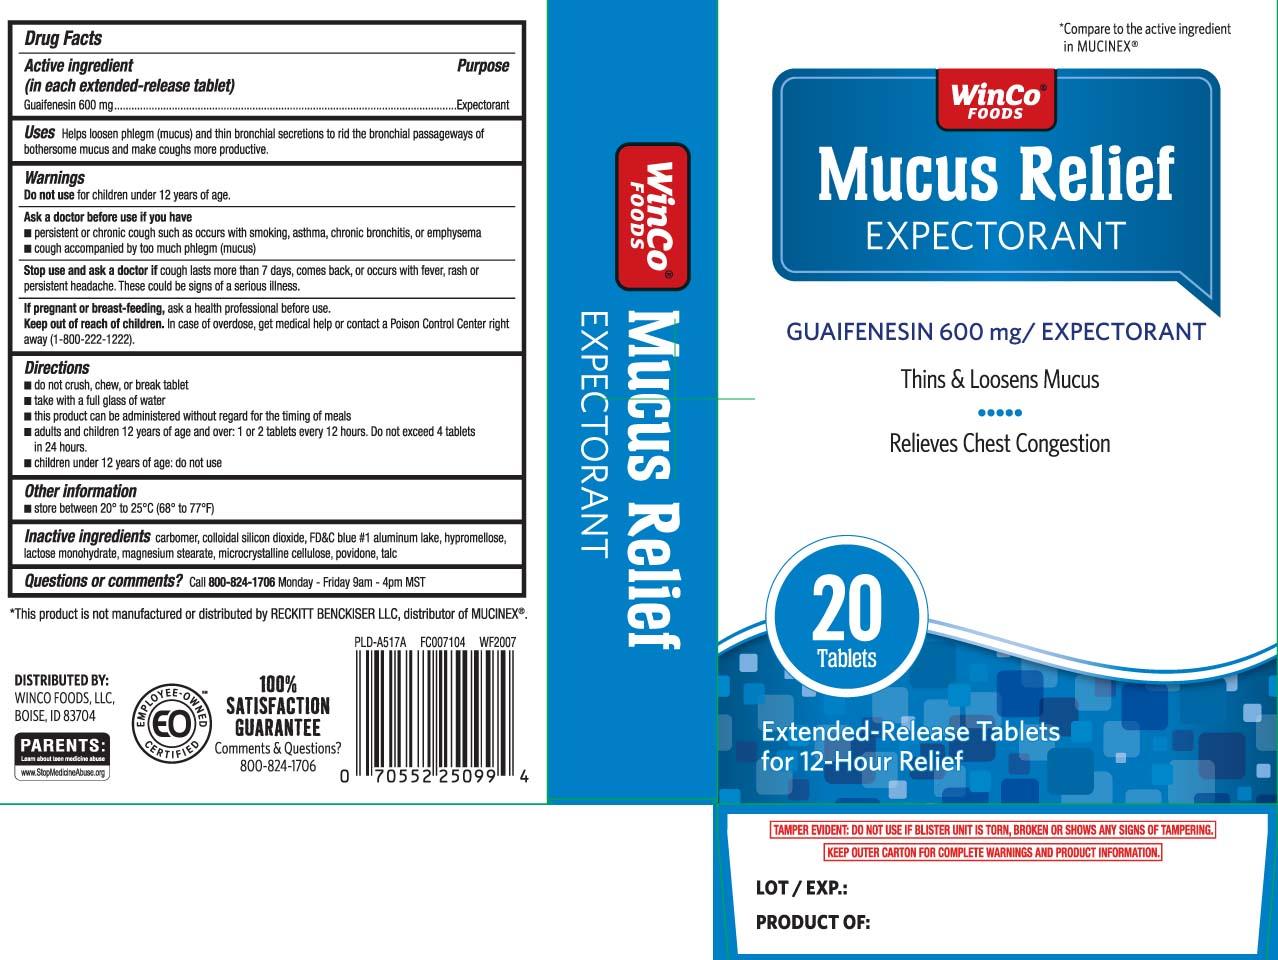 Guaifenesin 600 mg